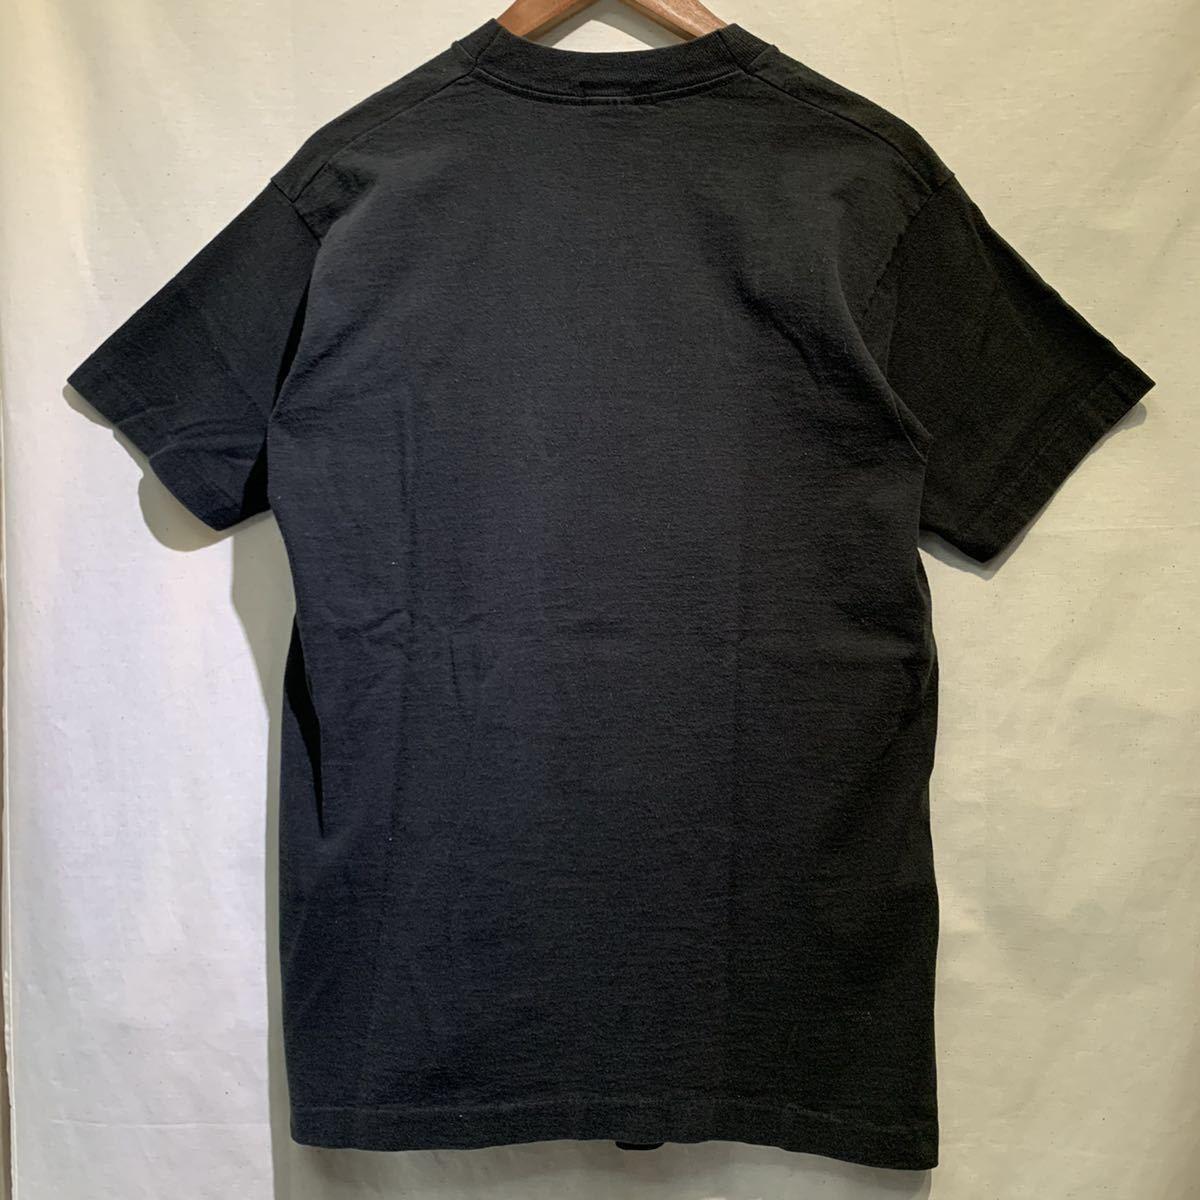 "90s Vintage アート ""NOEL DE MELLO"" フォト Tシャツ USA製 fruit of the loom 黒 ヴィンテージ / 古着 映画 ムービー バンド 80s"